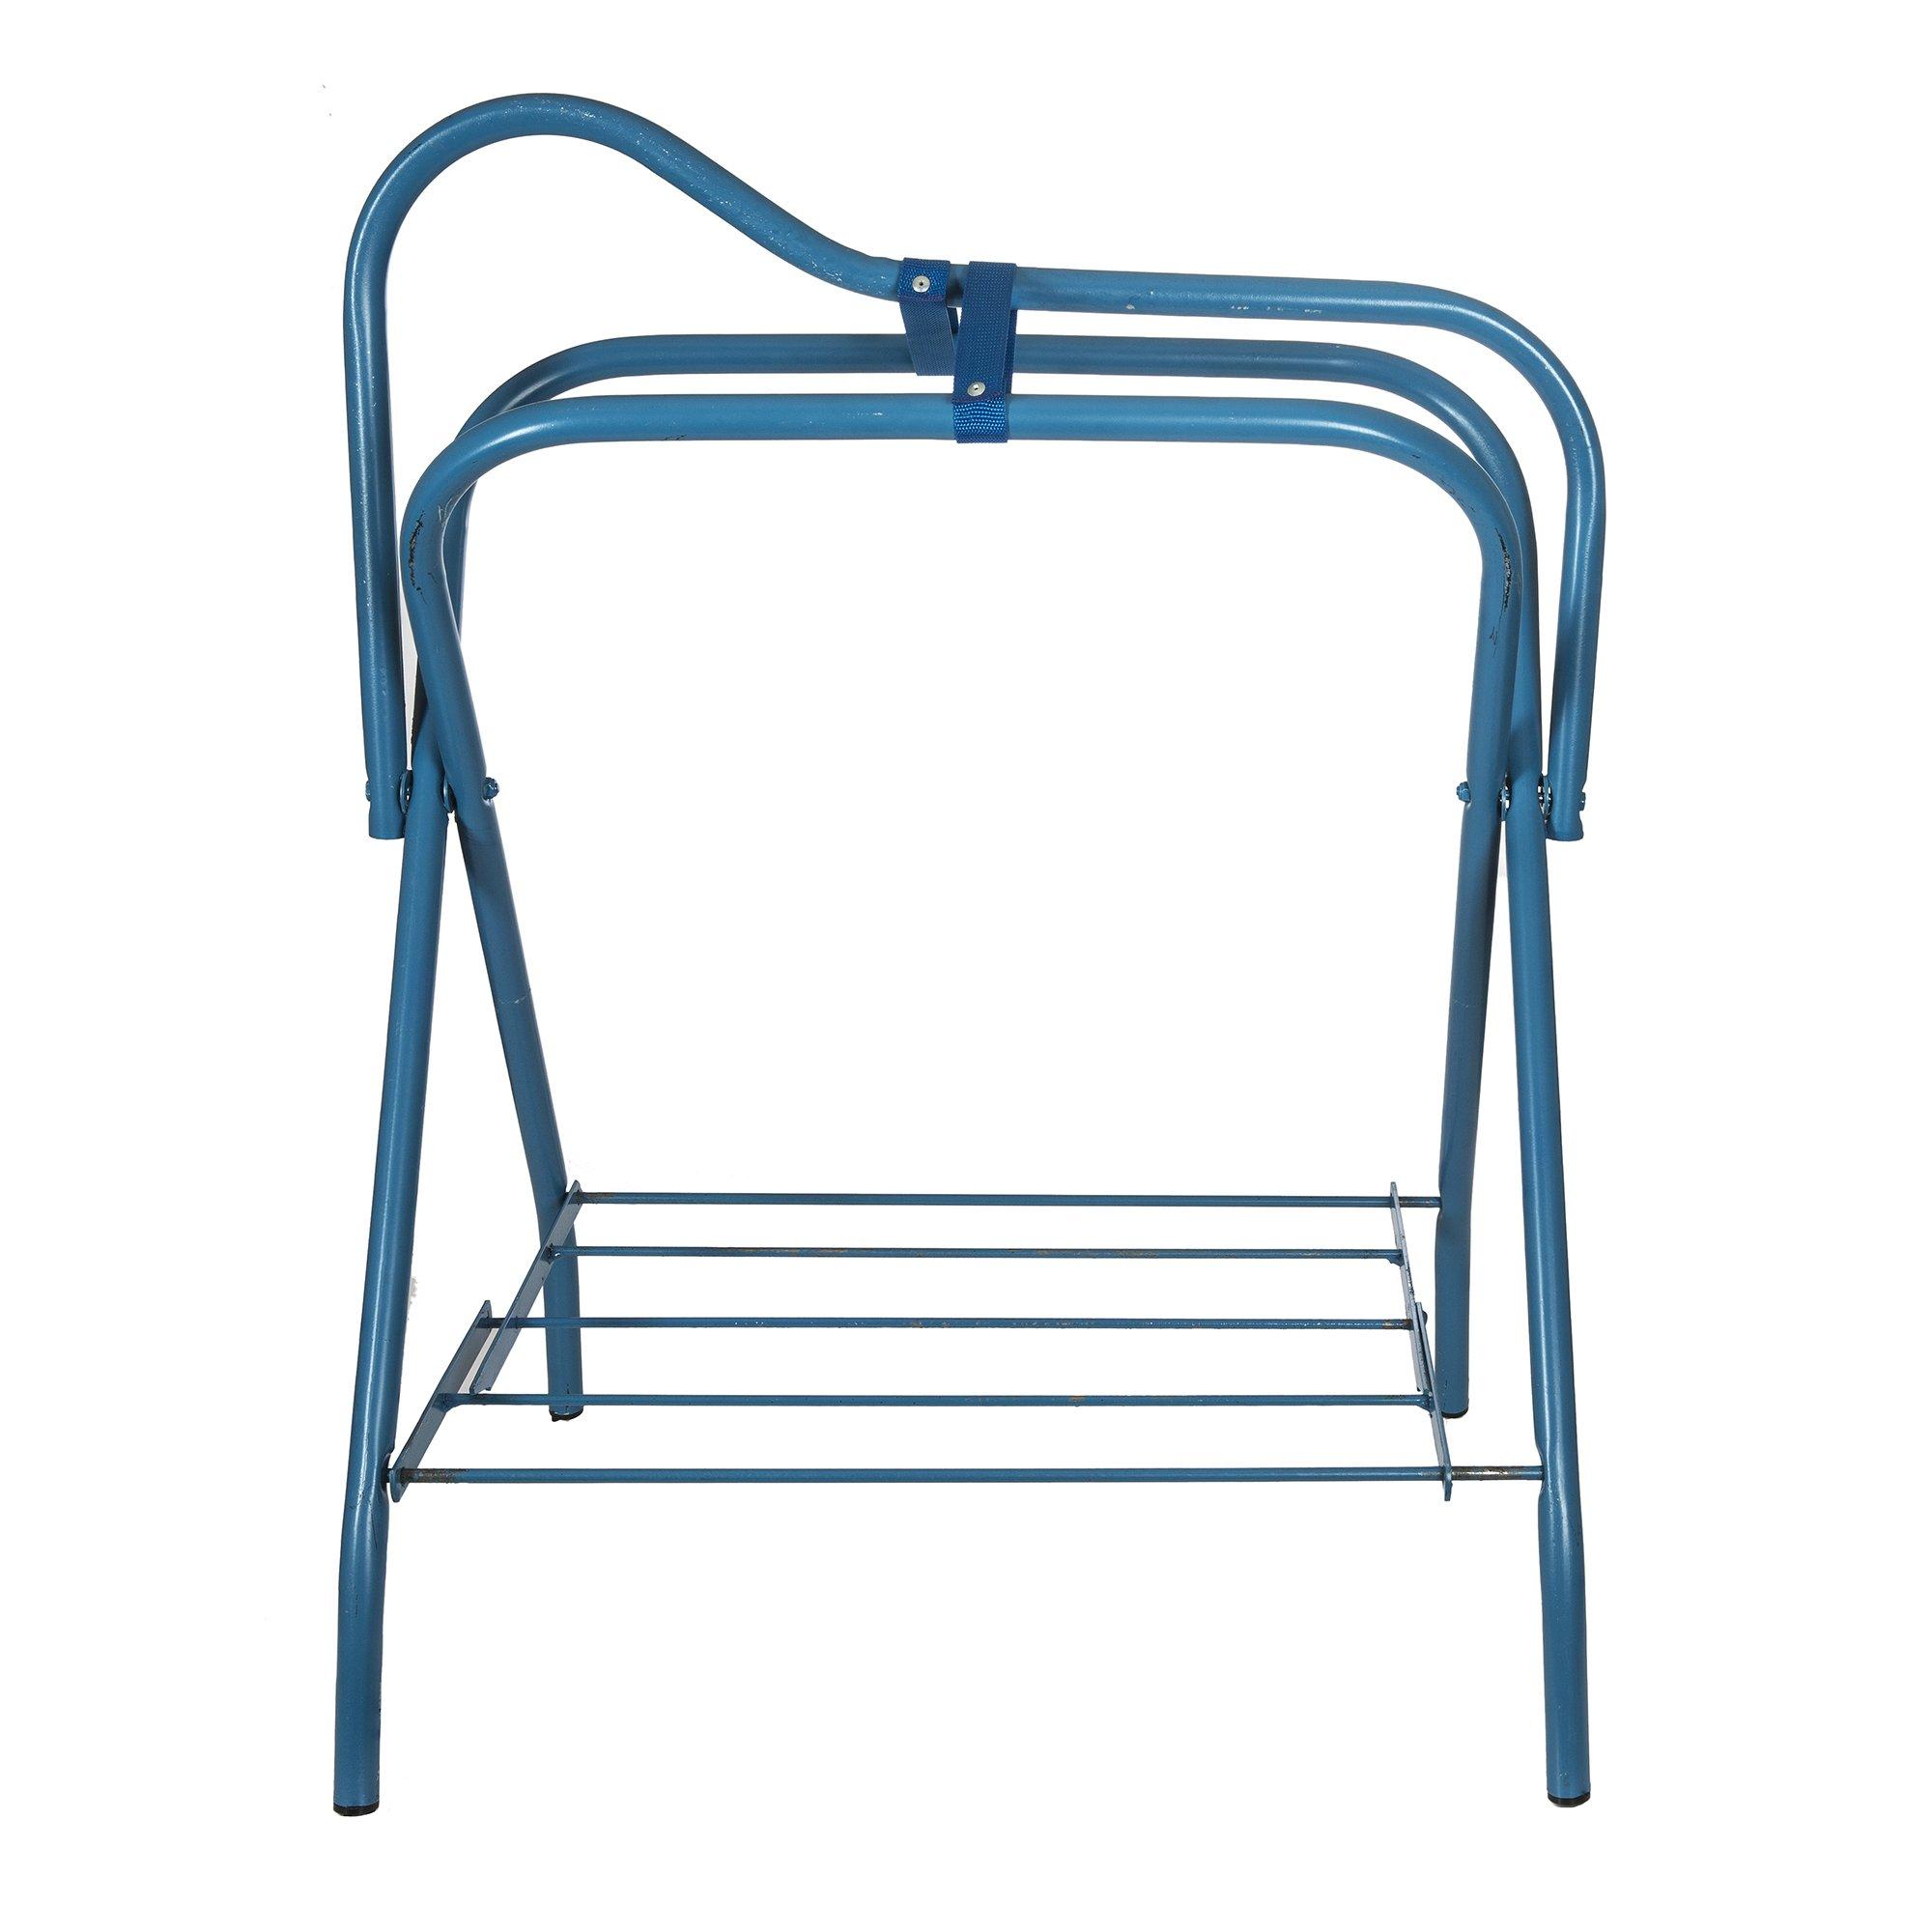 Intrepid International Folding Saddle Stand, Blue